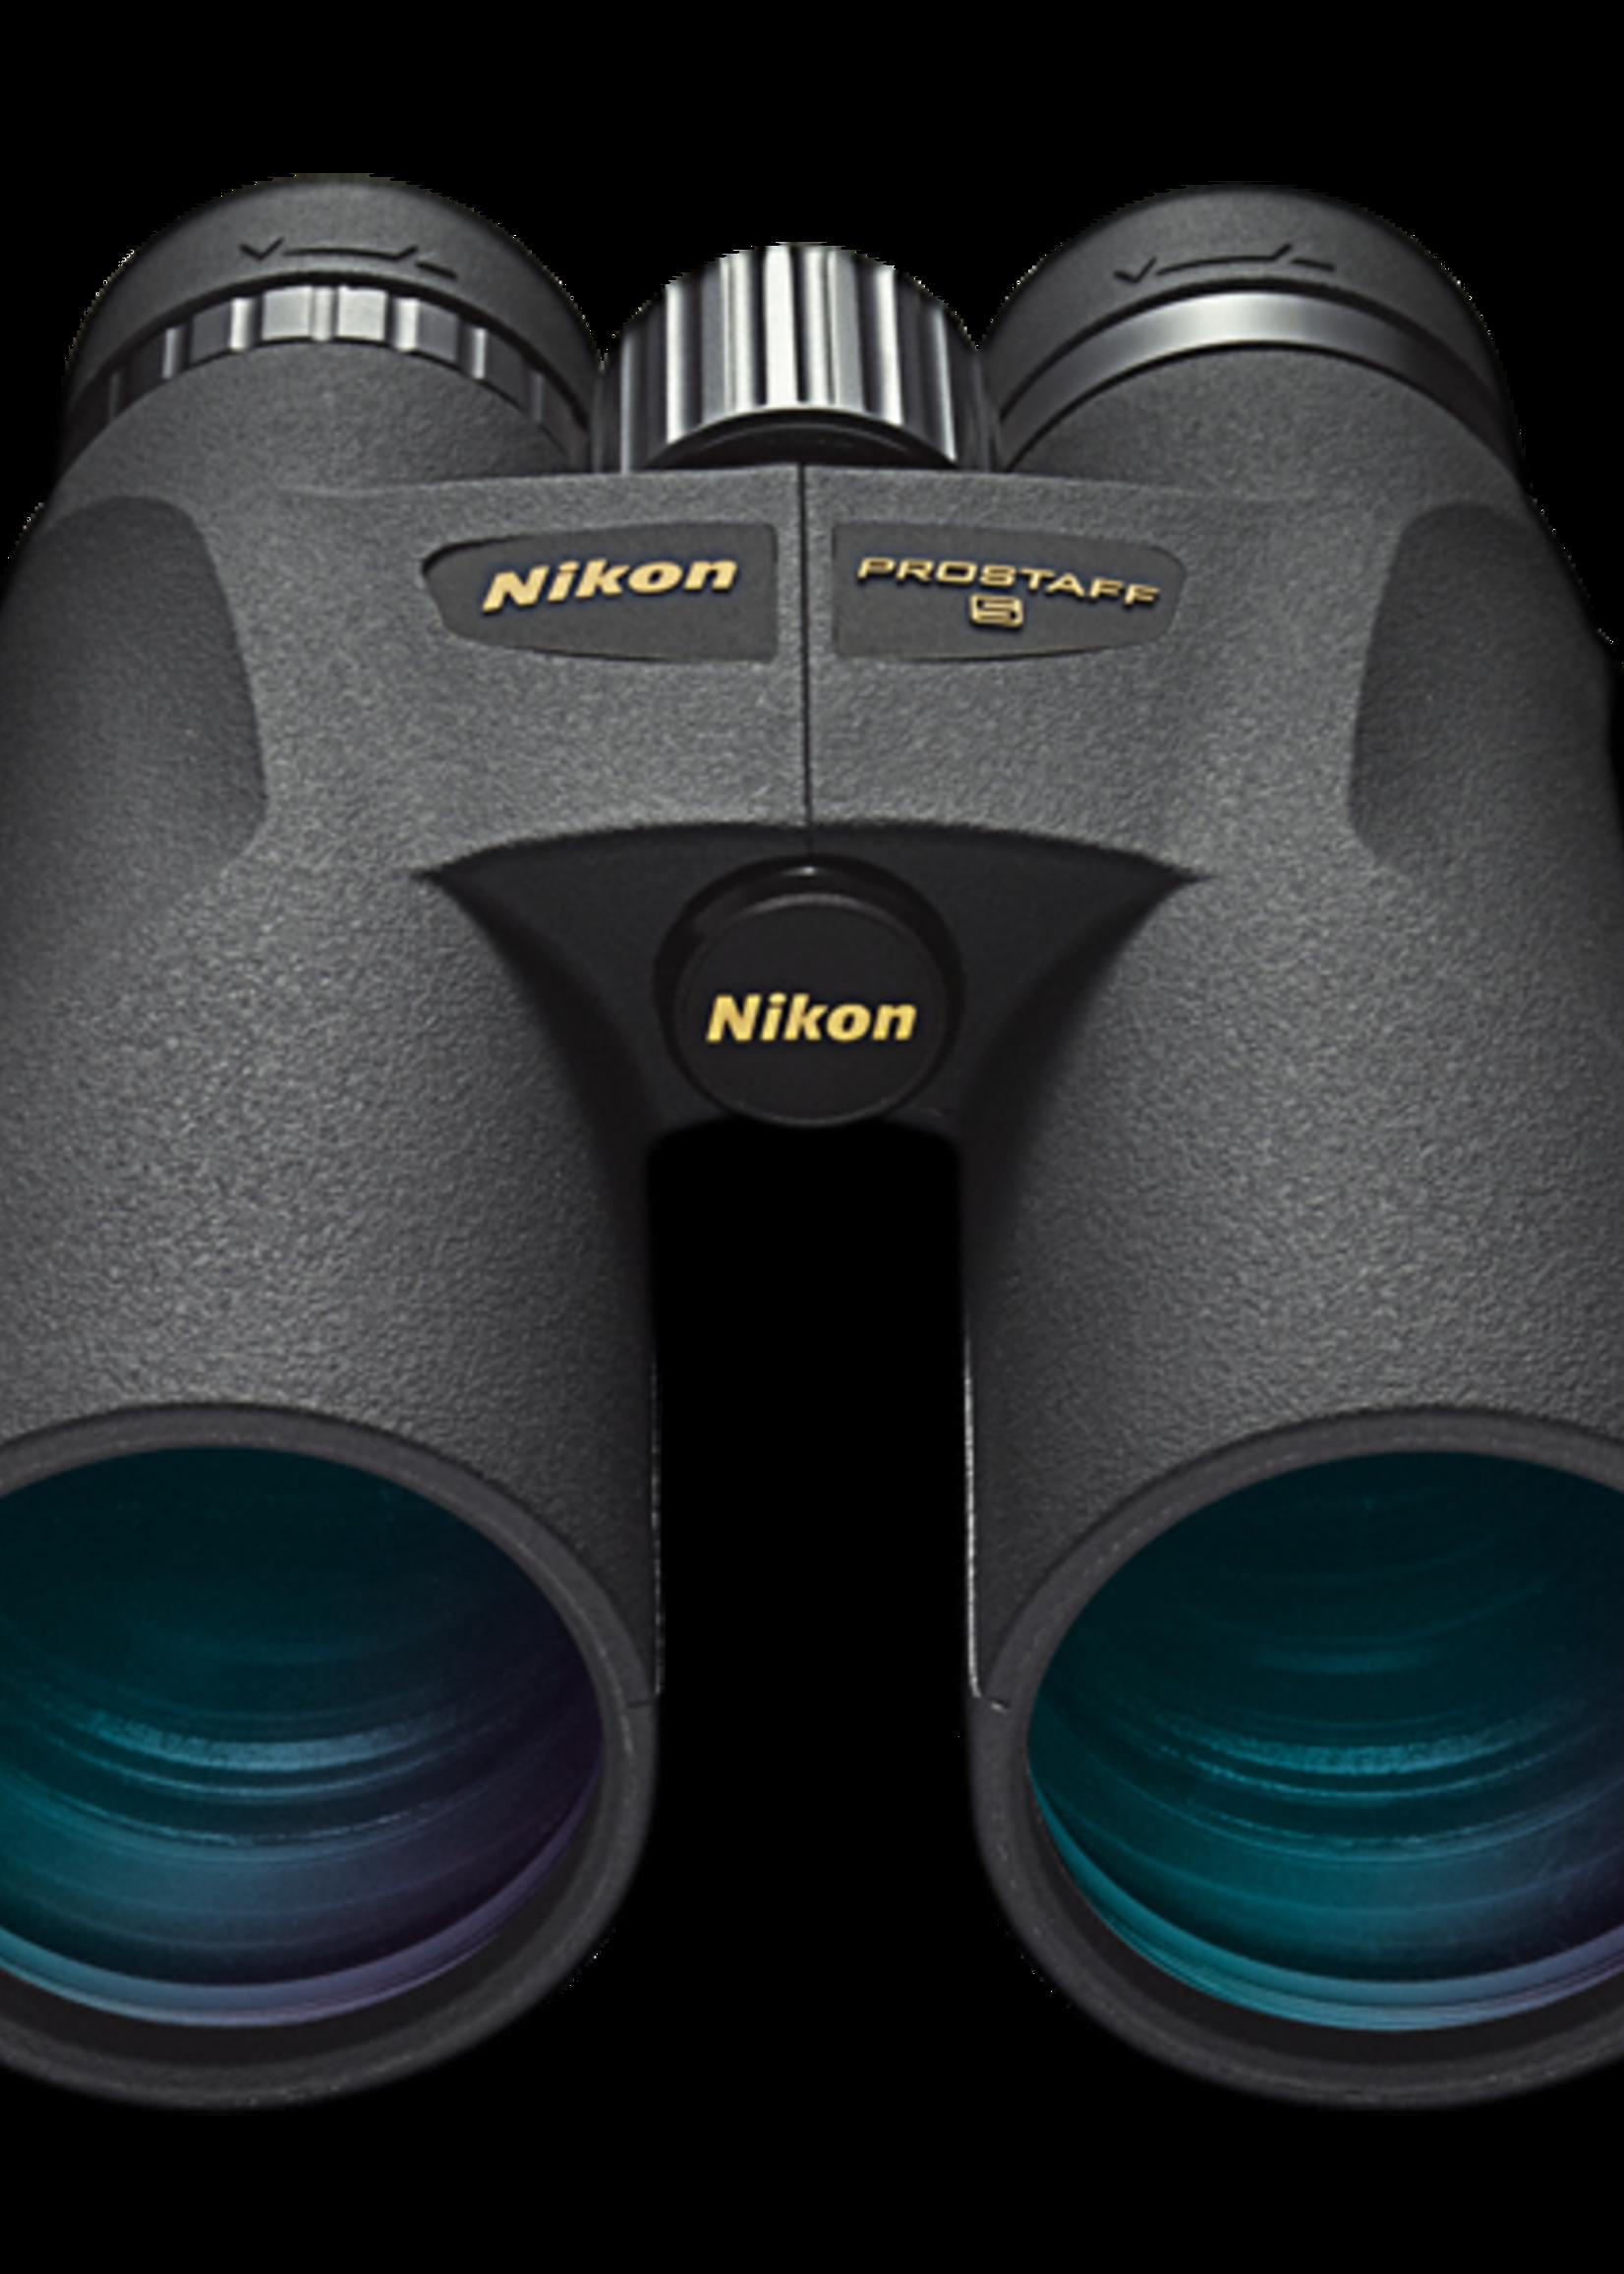 Nikon inc Nikon - ProStaff 5 - 12x50